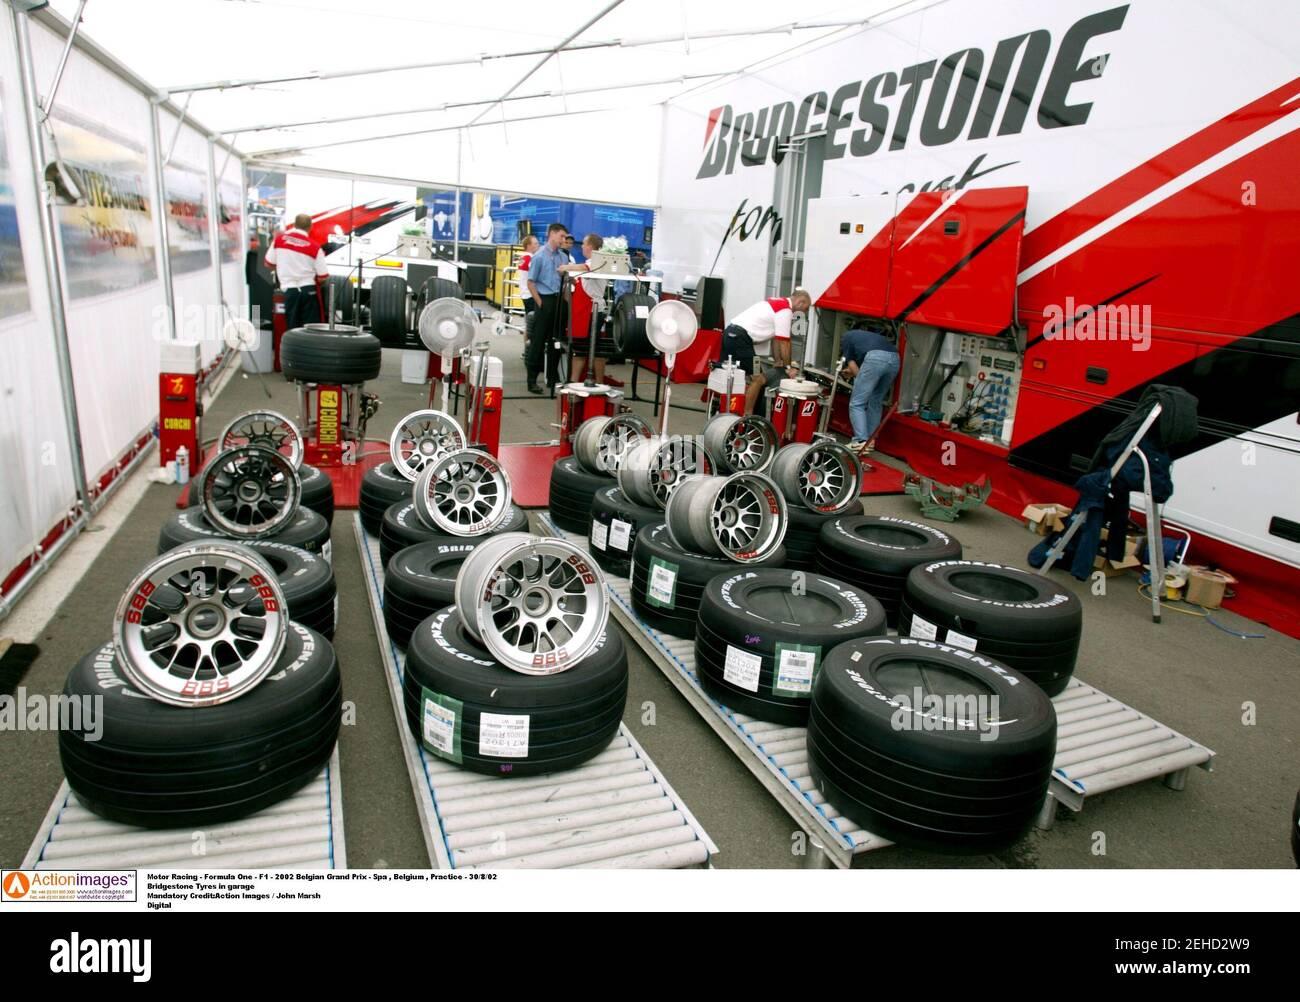 Bridgestone Tyres Motorsport Car Racing Sign Garage Workshop Banner Display